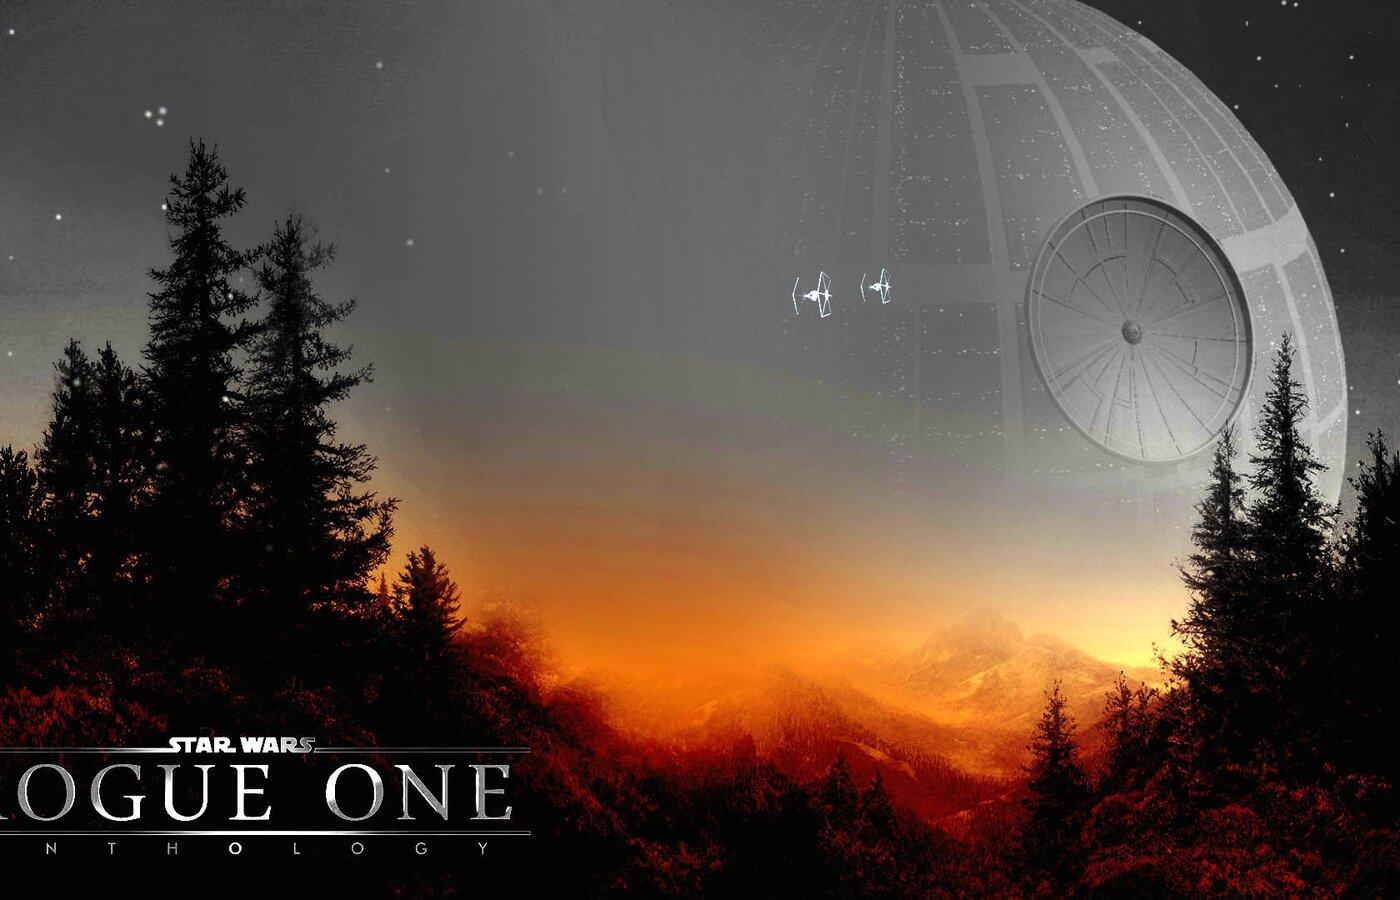 1400x900 Star Wars Rogue One Anthology 1400x900 Resolution Hd 4k